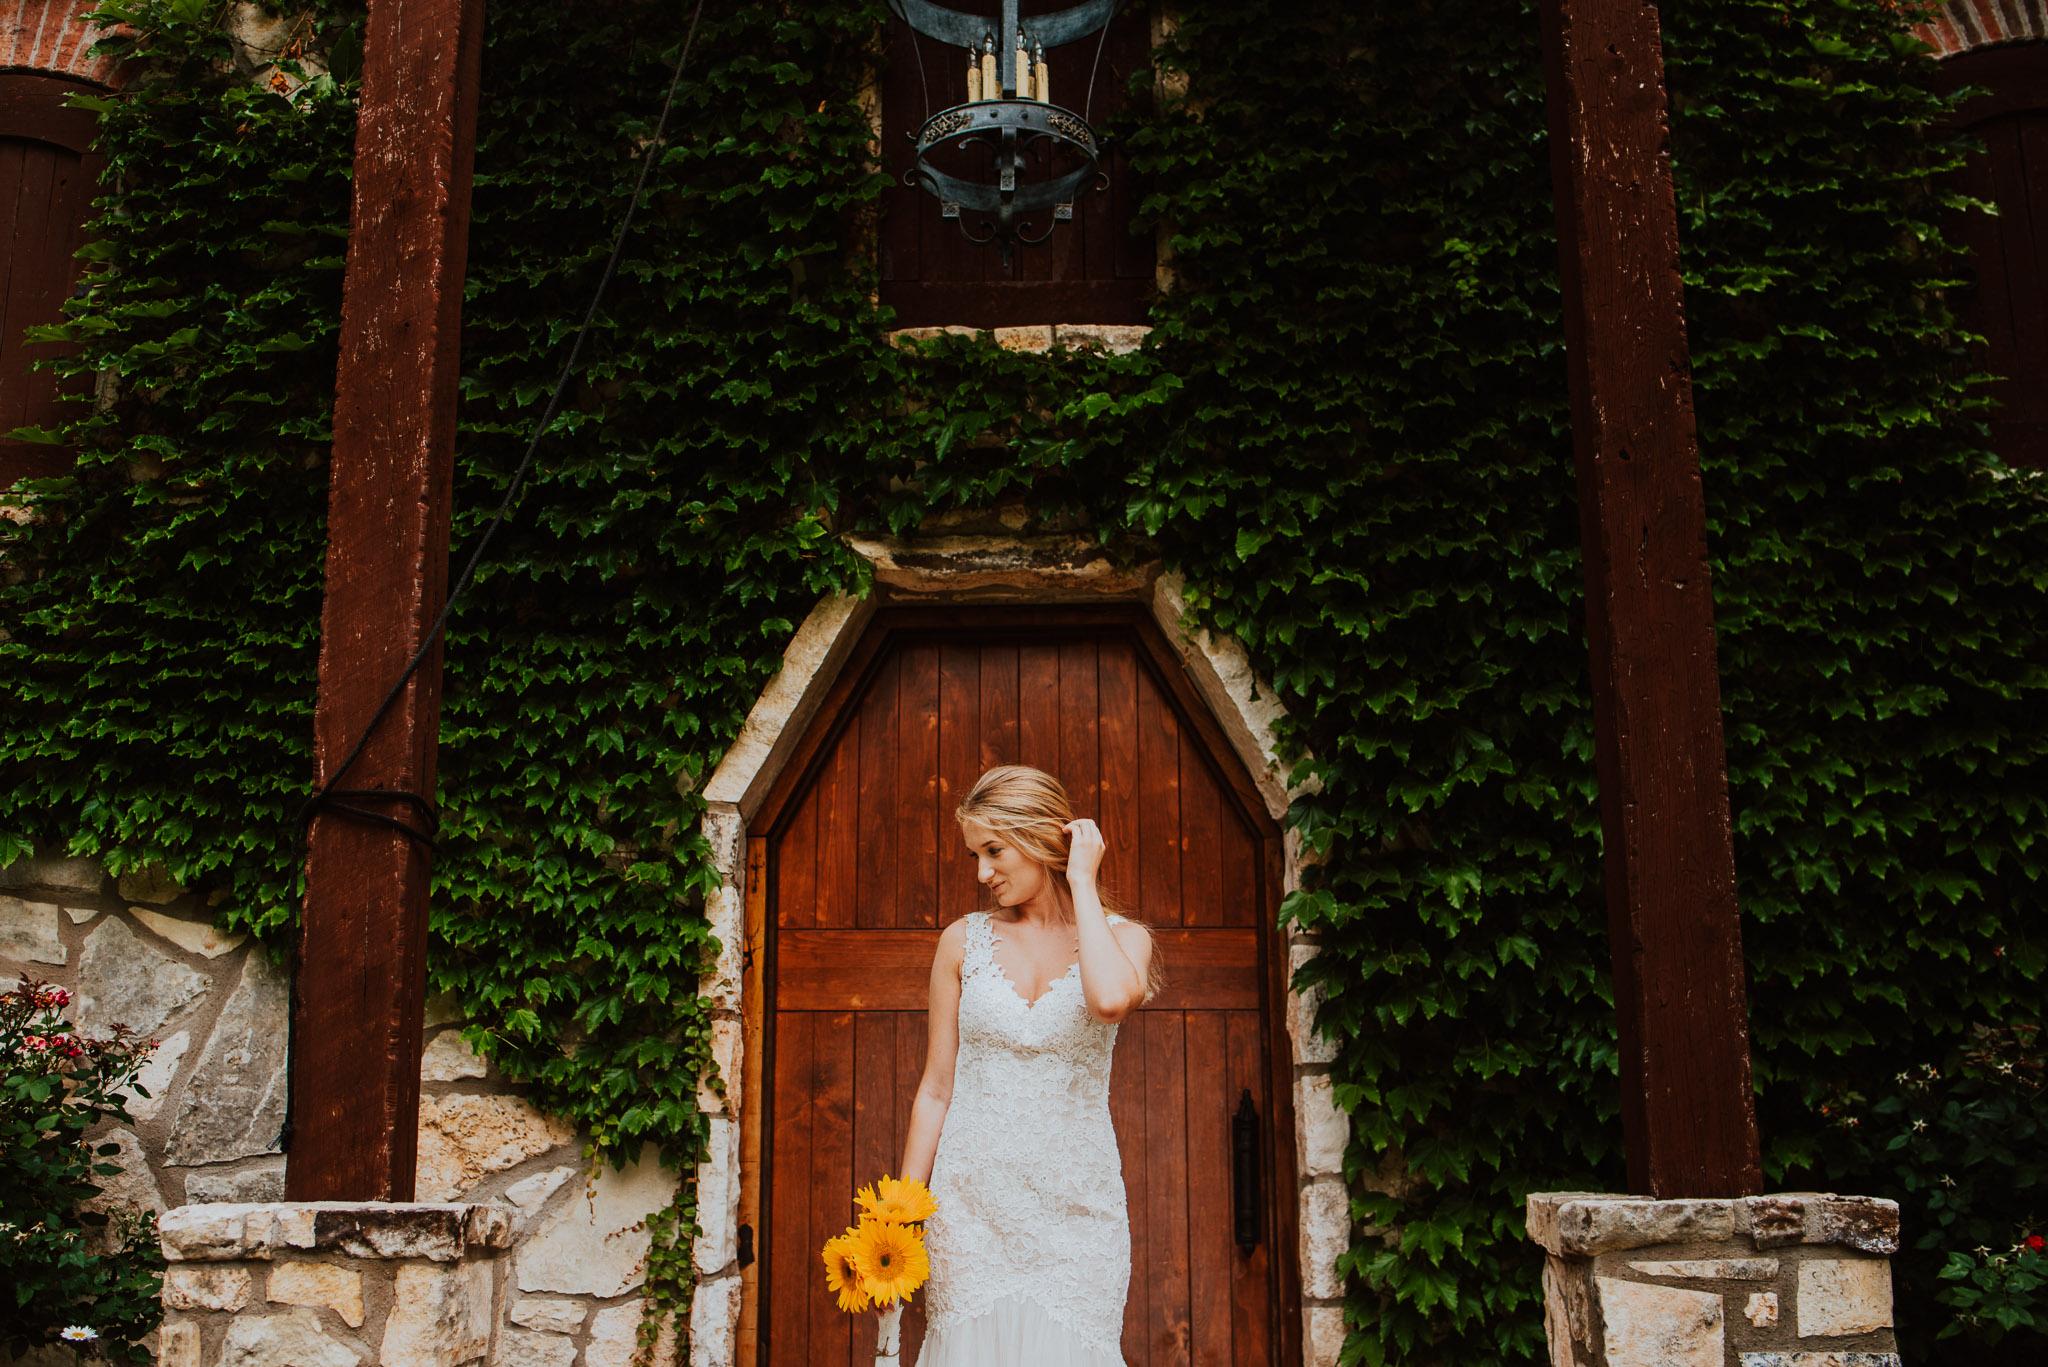 Christoval-vineyard-wedding-heather-justin-0011.jpg